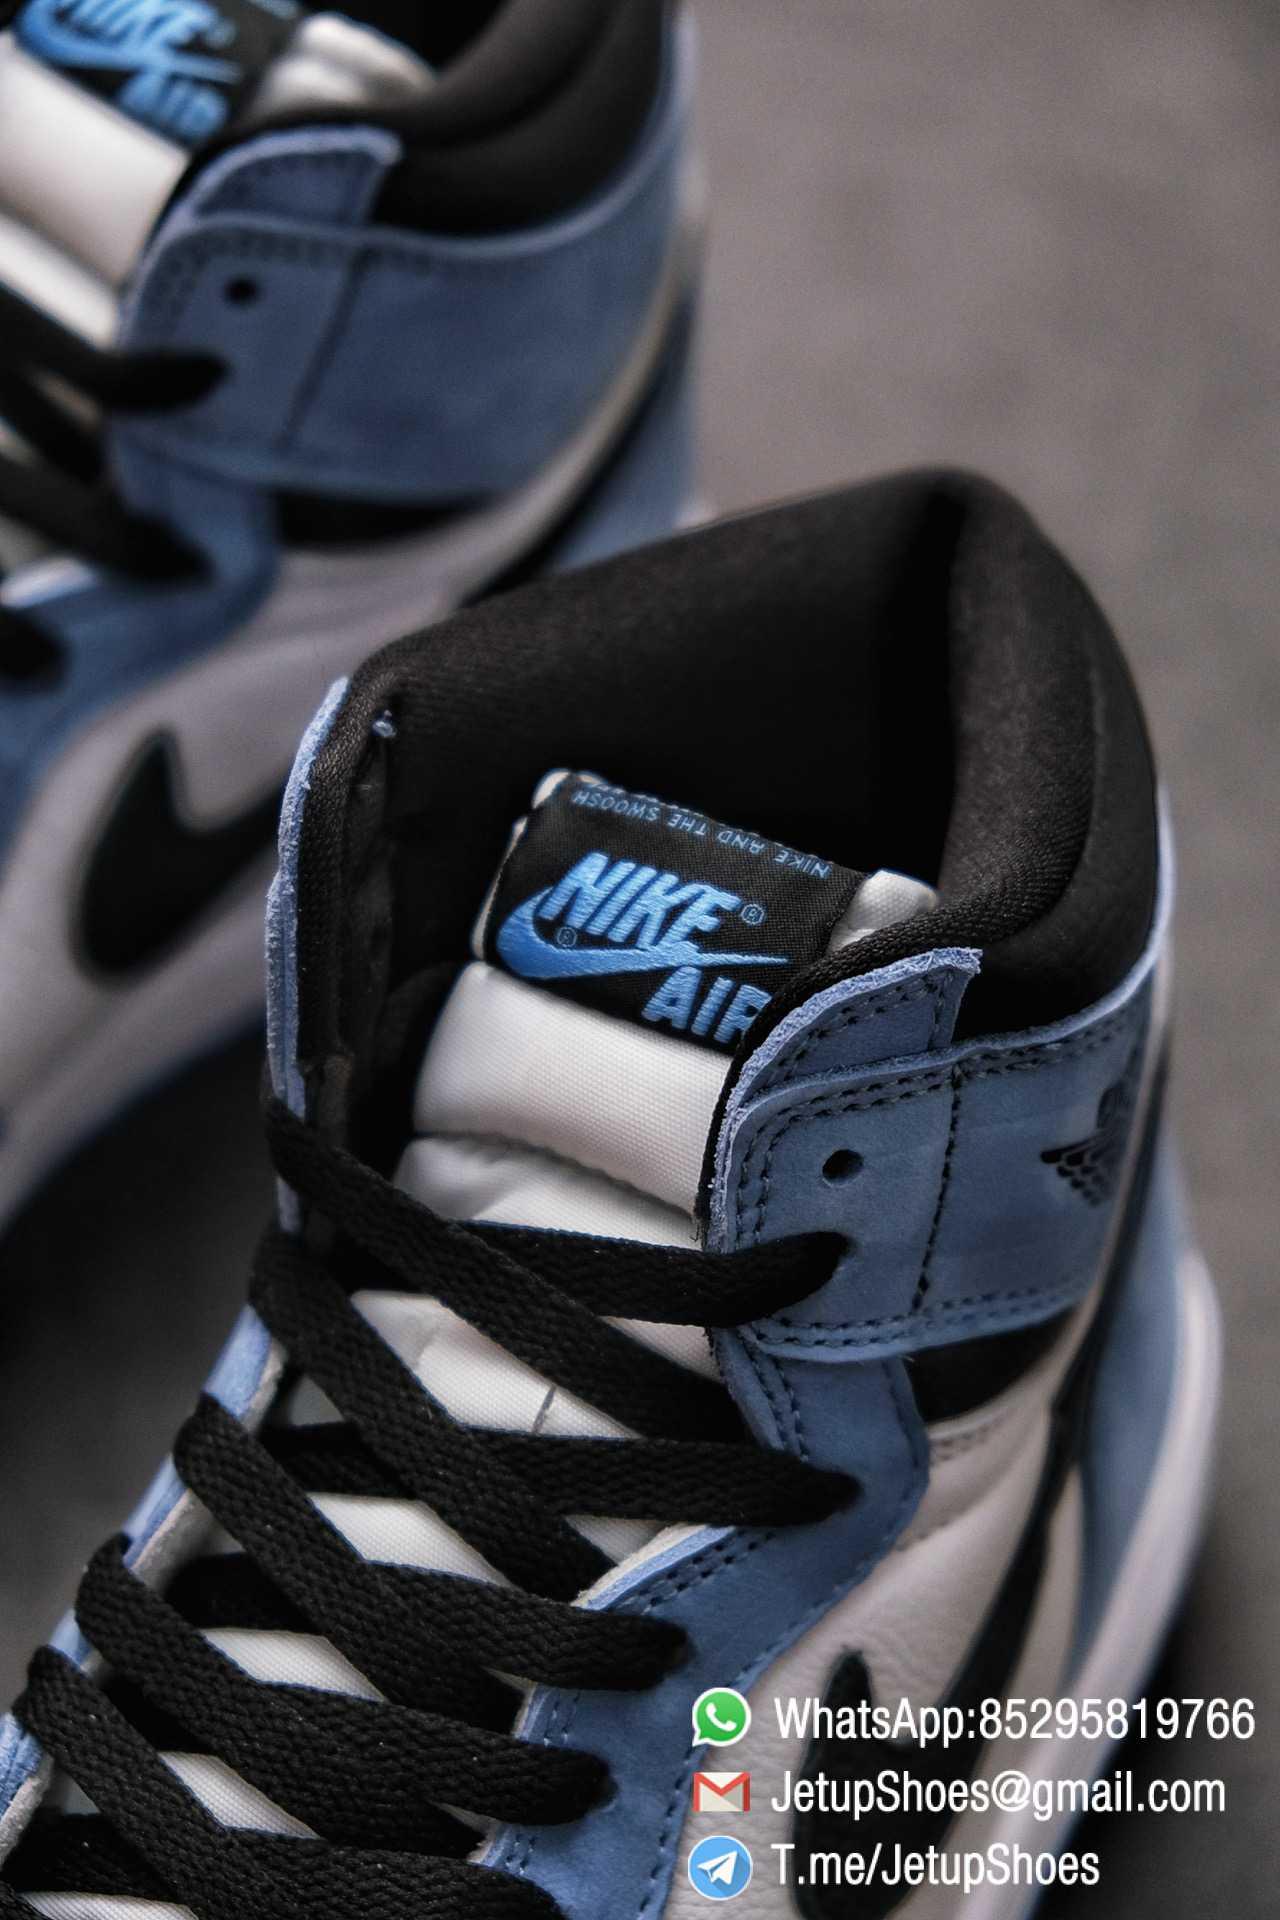 Replica Snkrs Air Jordan 1 Retro High OG University Blue Leather White Upper Blue Overlays Black Signature Swoosh SKU 555088 134 014